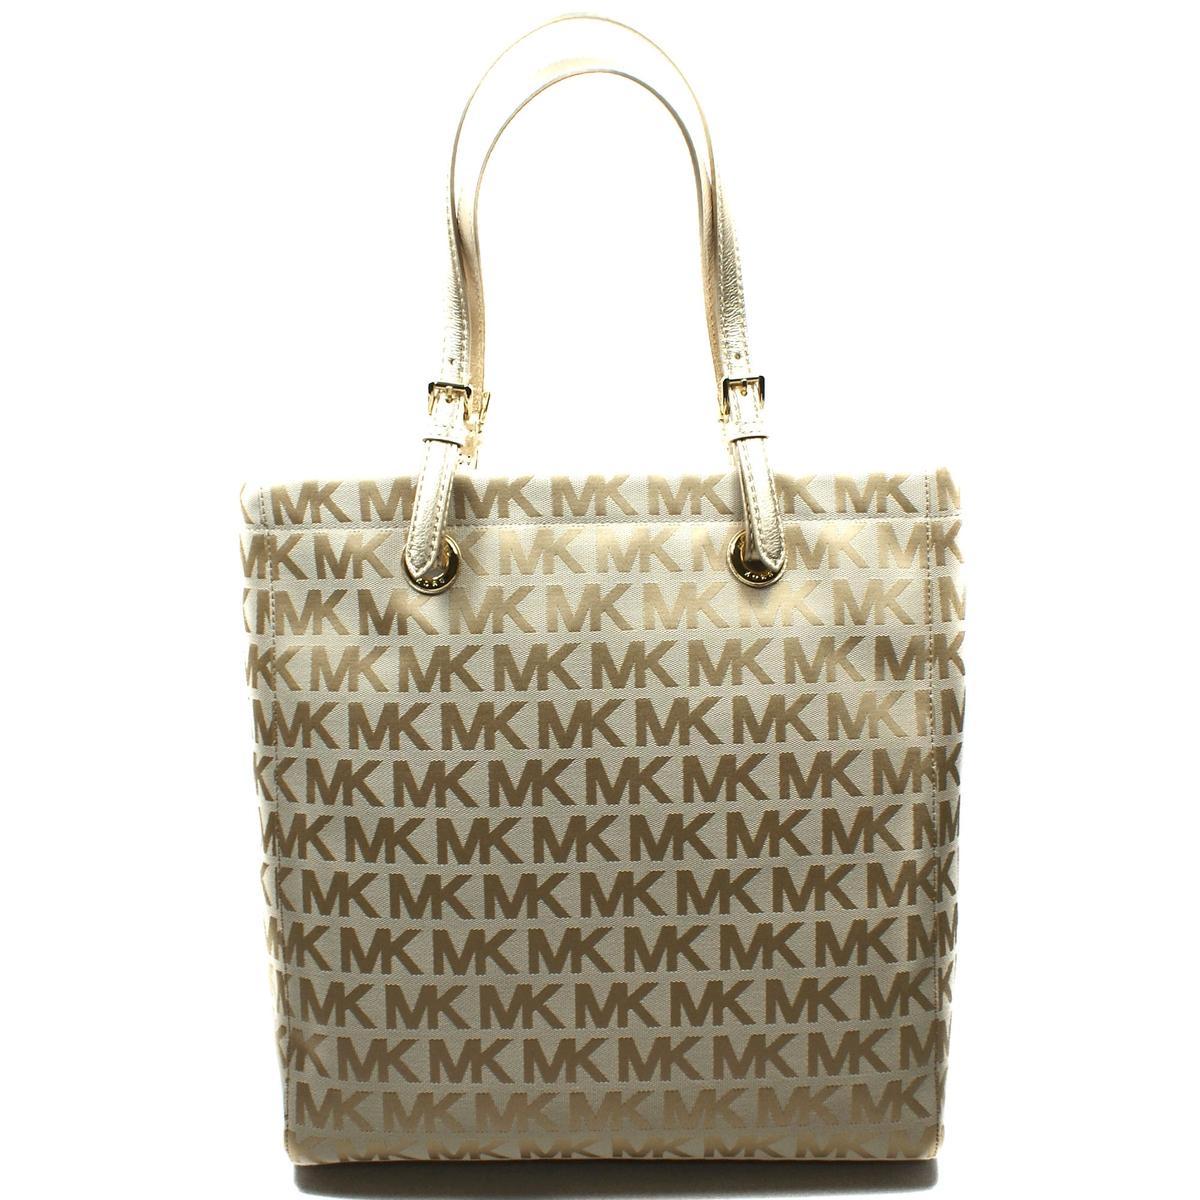 Case Design micheal kors phone cases : Michael Kors MK Signature Jacquard Medium Tote Bag Gold #38T2XTTT2J ...